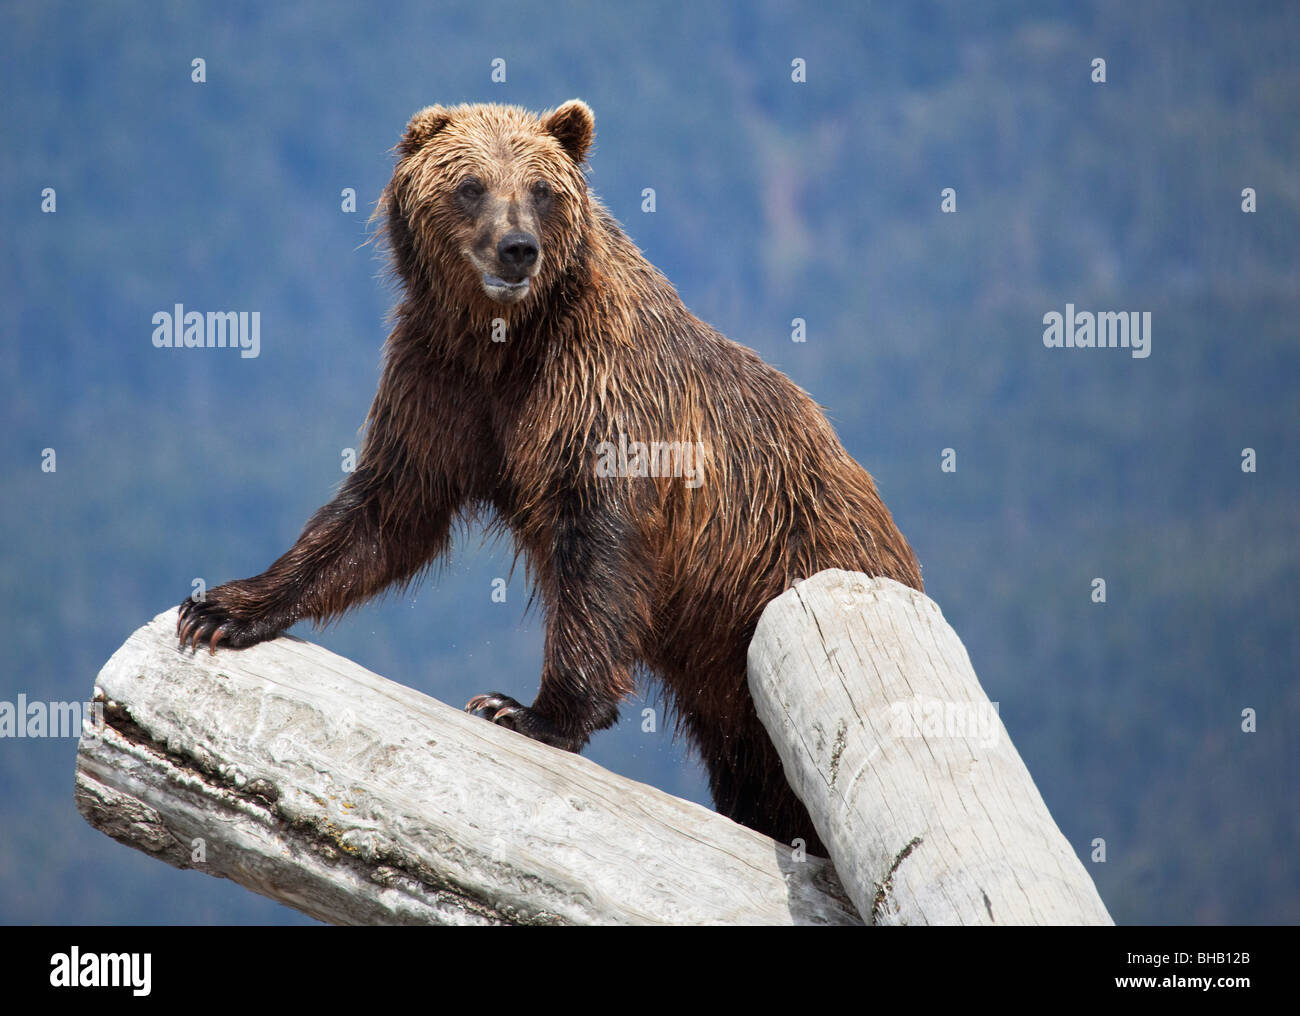 CAPTIVE Grizzly stands on a log at the Alaska Wildlife Conservation Center, Alaska CAPTIVE - Stock Image